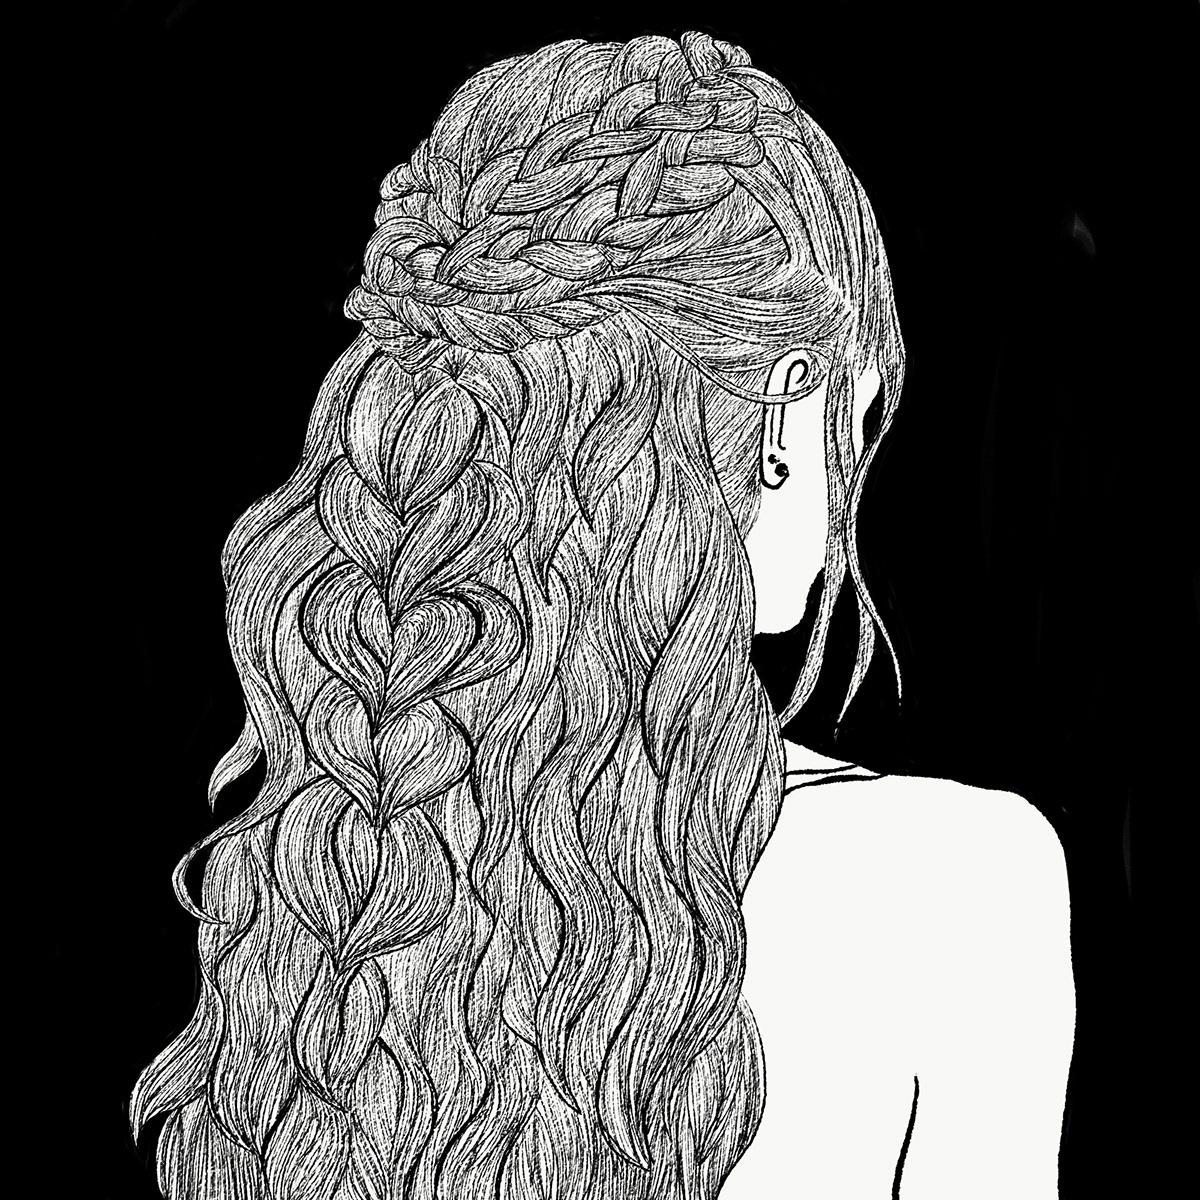 black and white braids detail Drawing  hair ILLUSTRATION  iraswatimanish line art line drawing